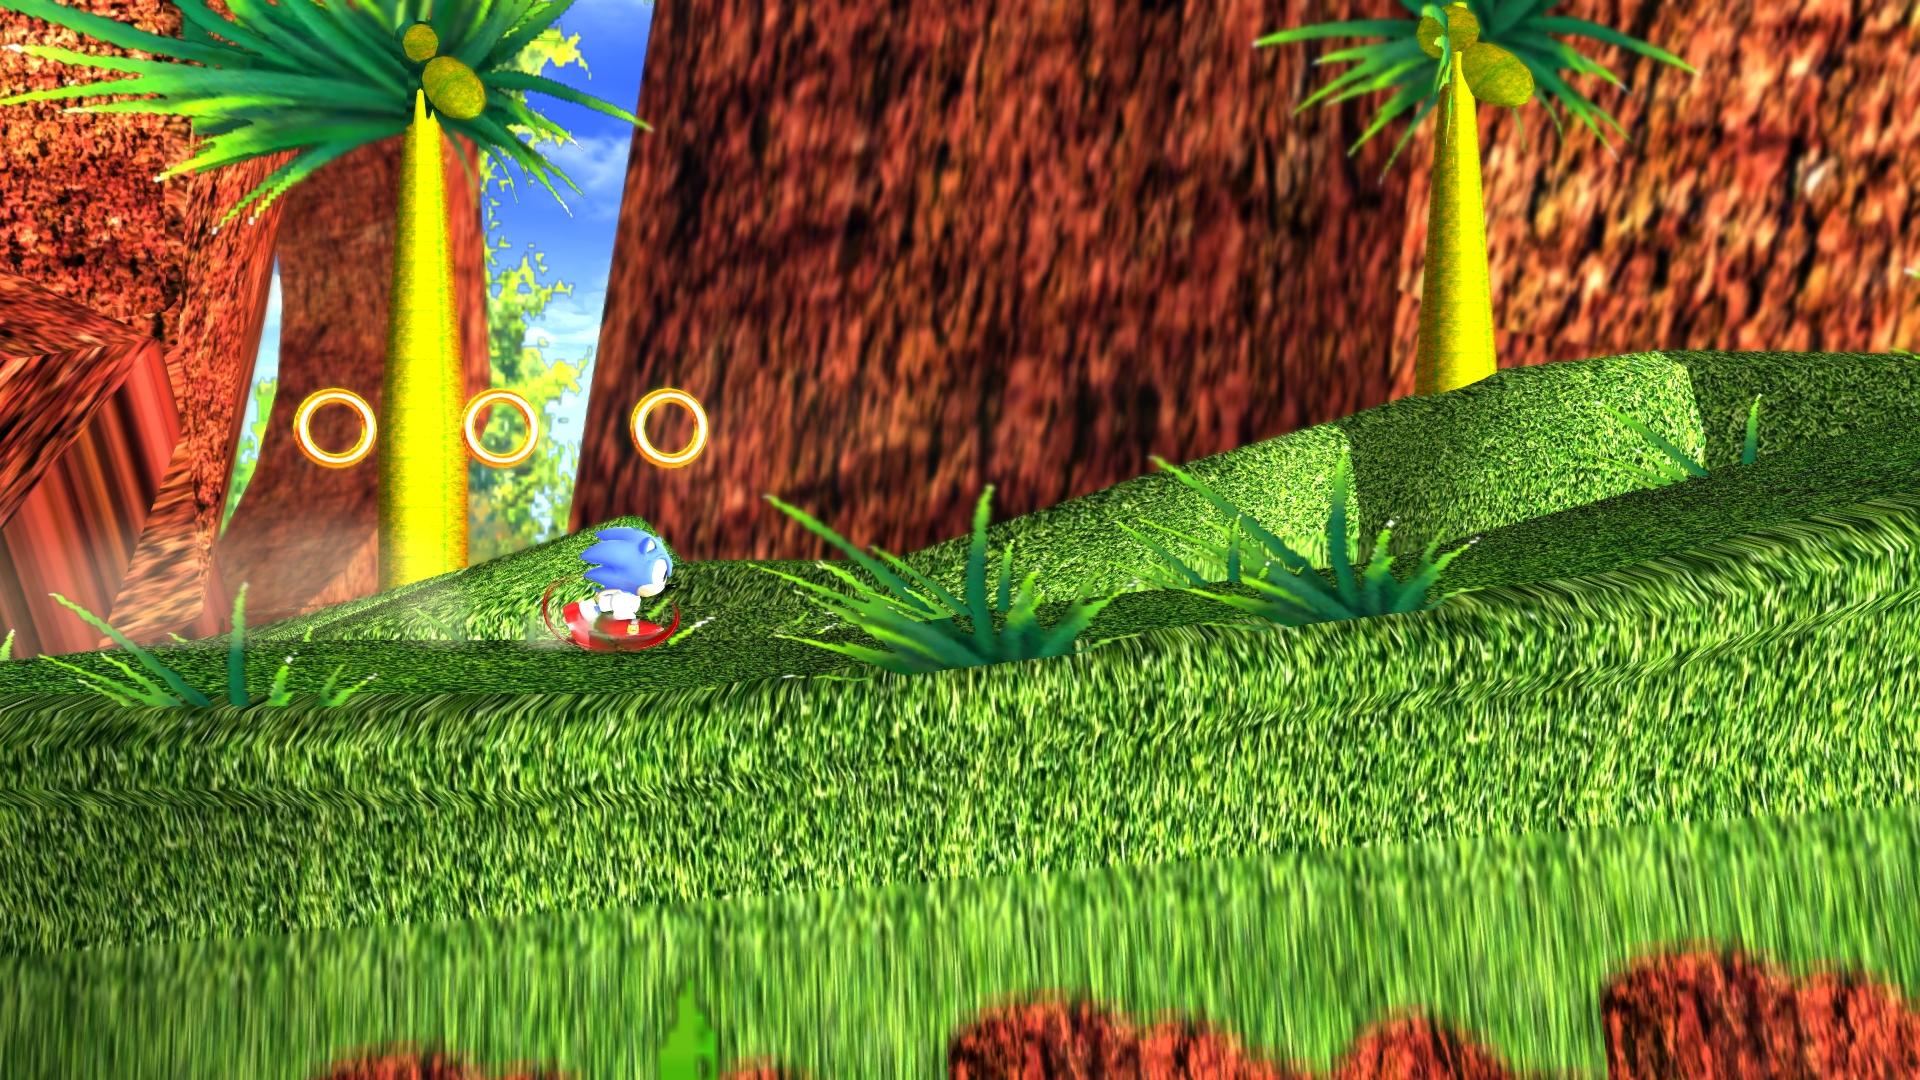 Angel Island Act 1 Classic Image Sonic Generations Knuckles Mod For Sonic Generations Mod Db